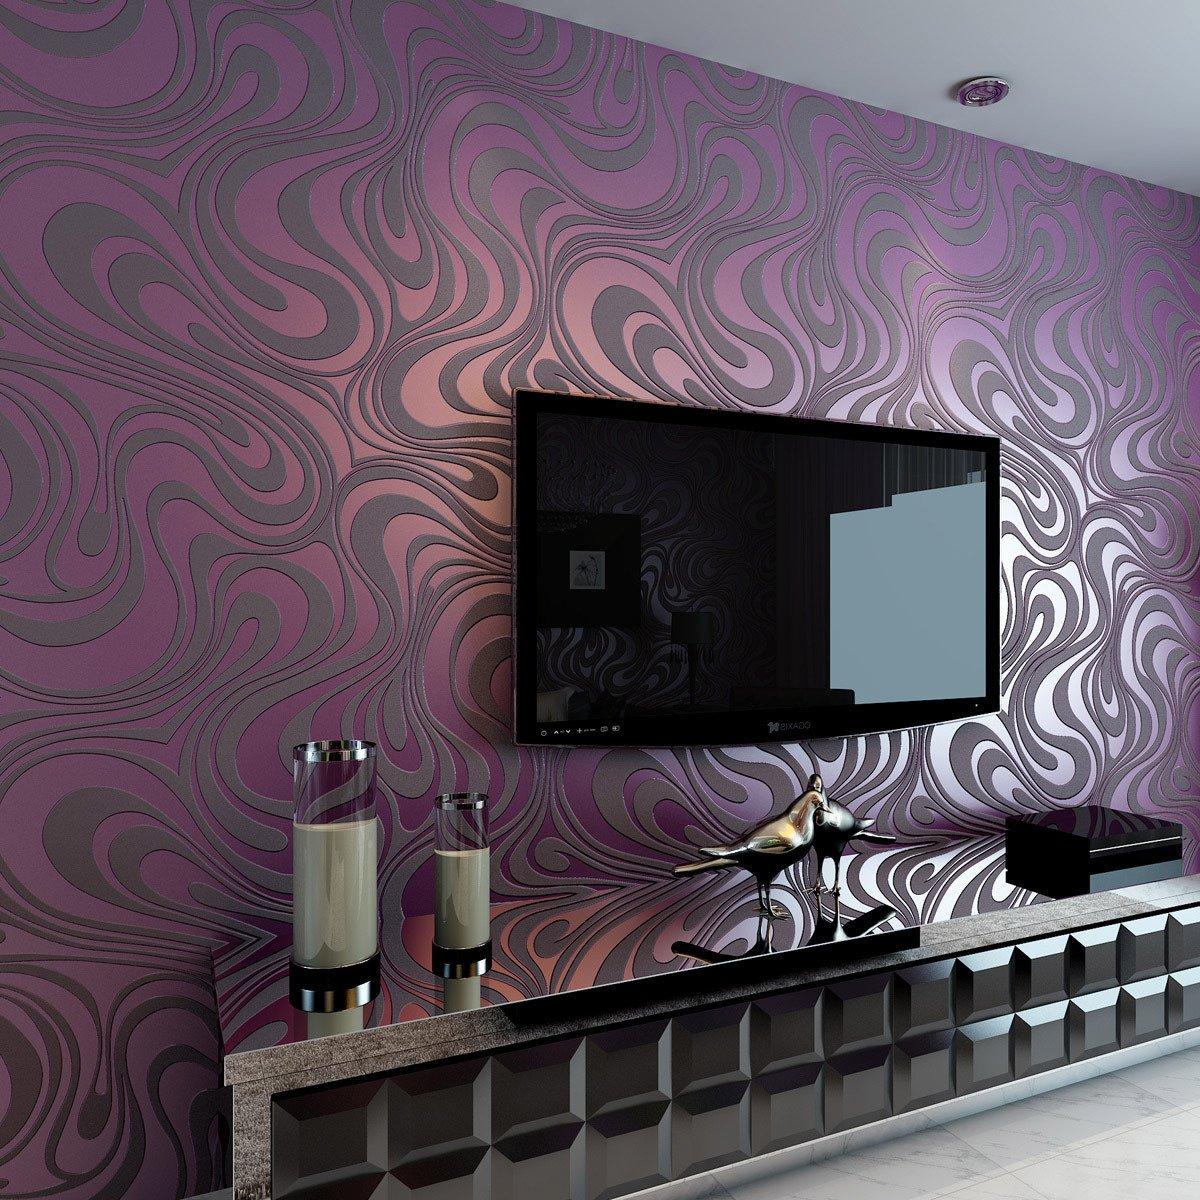 Amazing Hanmero Modern Minimalist Abstract Curves Glitter Non Woven 3D Wallpaper  For Bedroom Living Room TV Backdrop Purple: Amazon.co.uk: DIY U0026 Tools